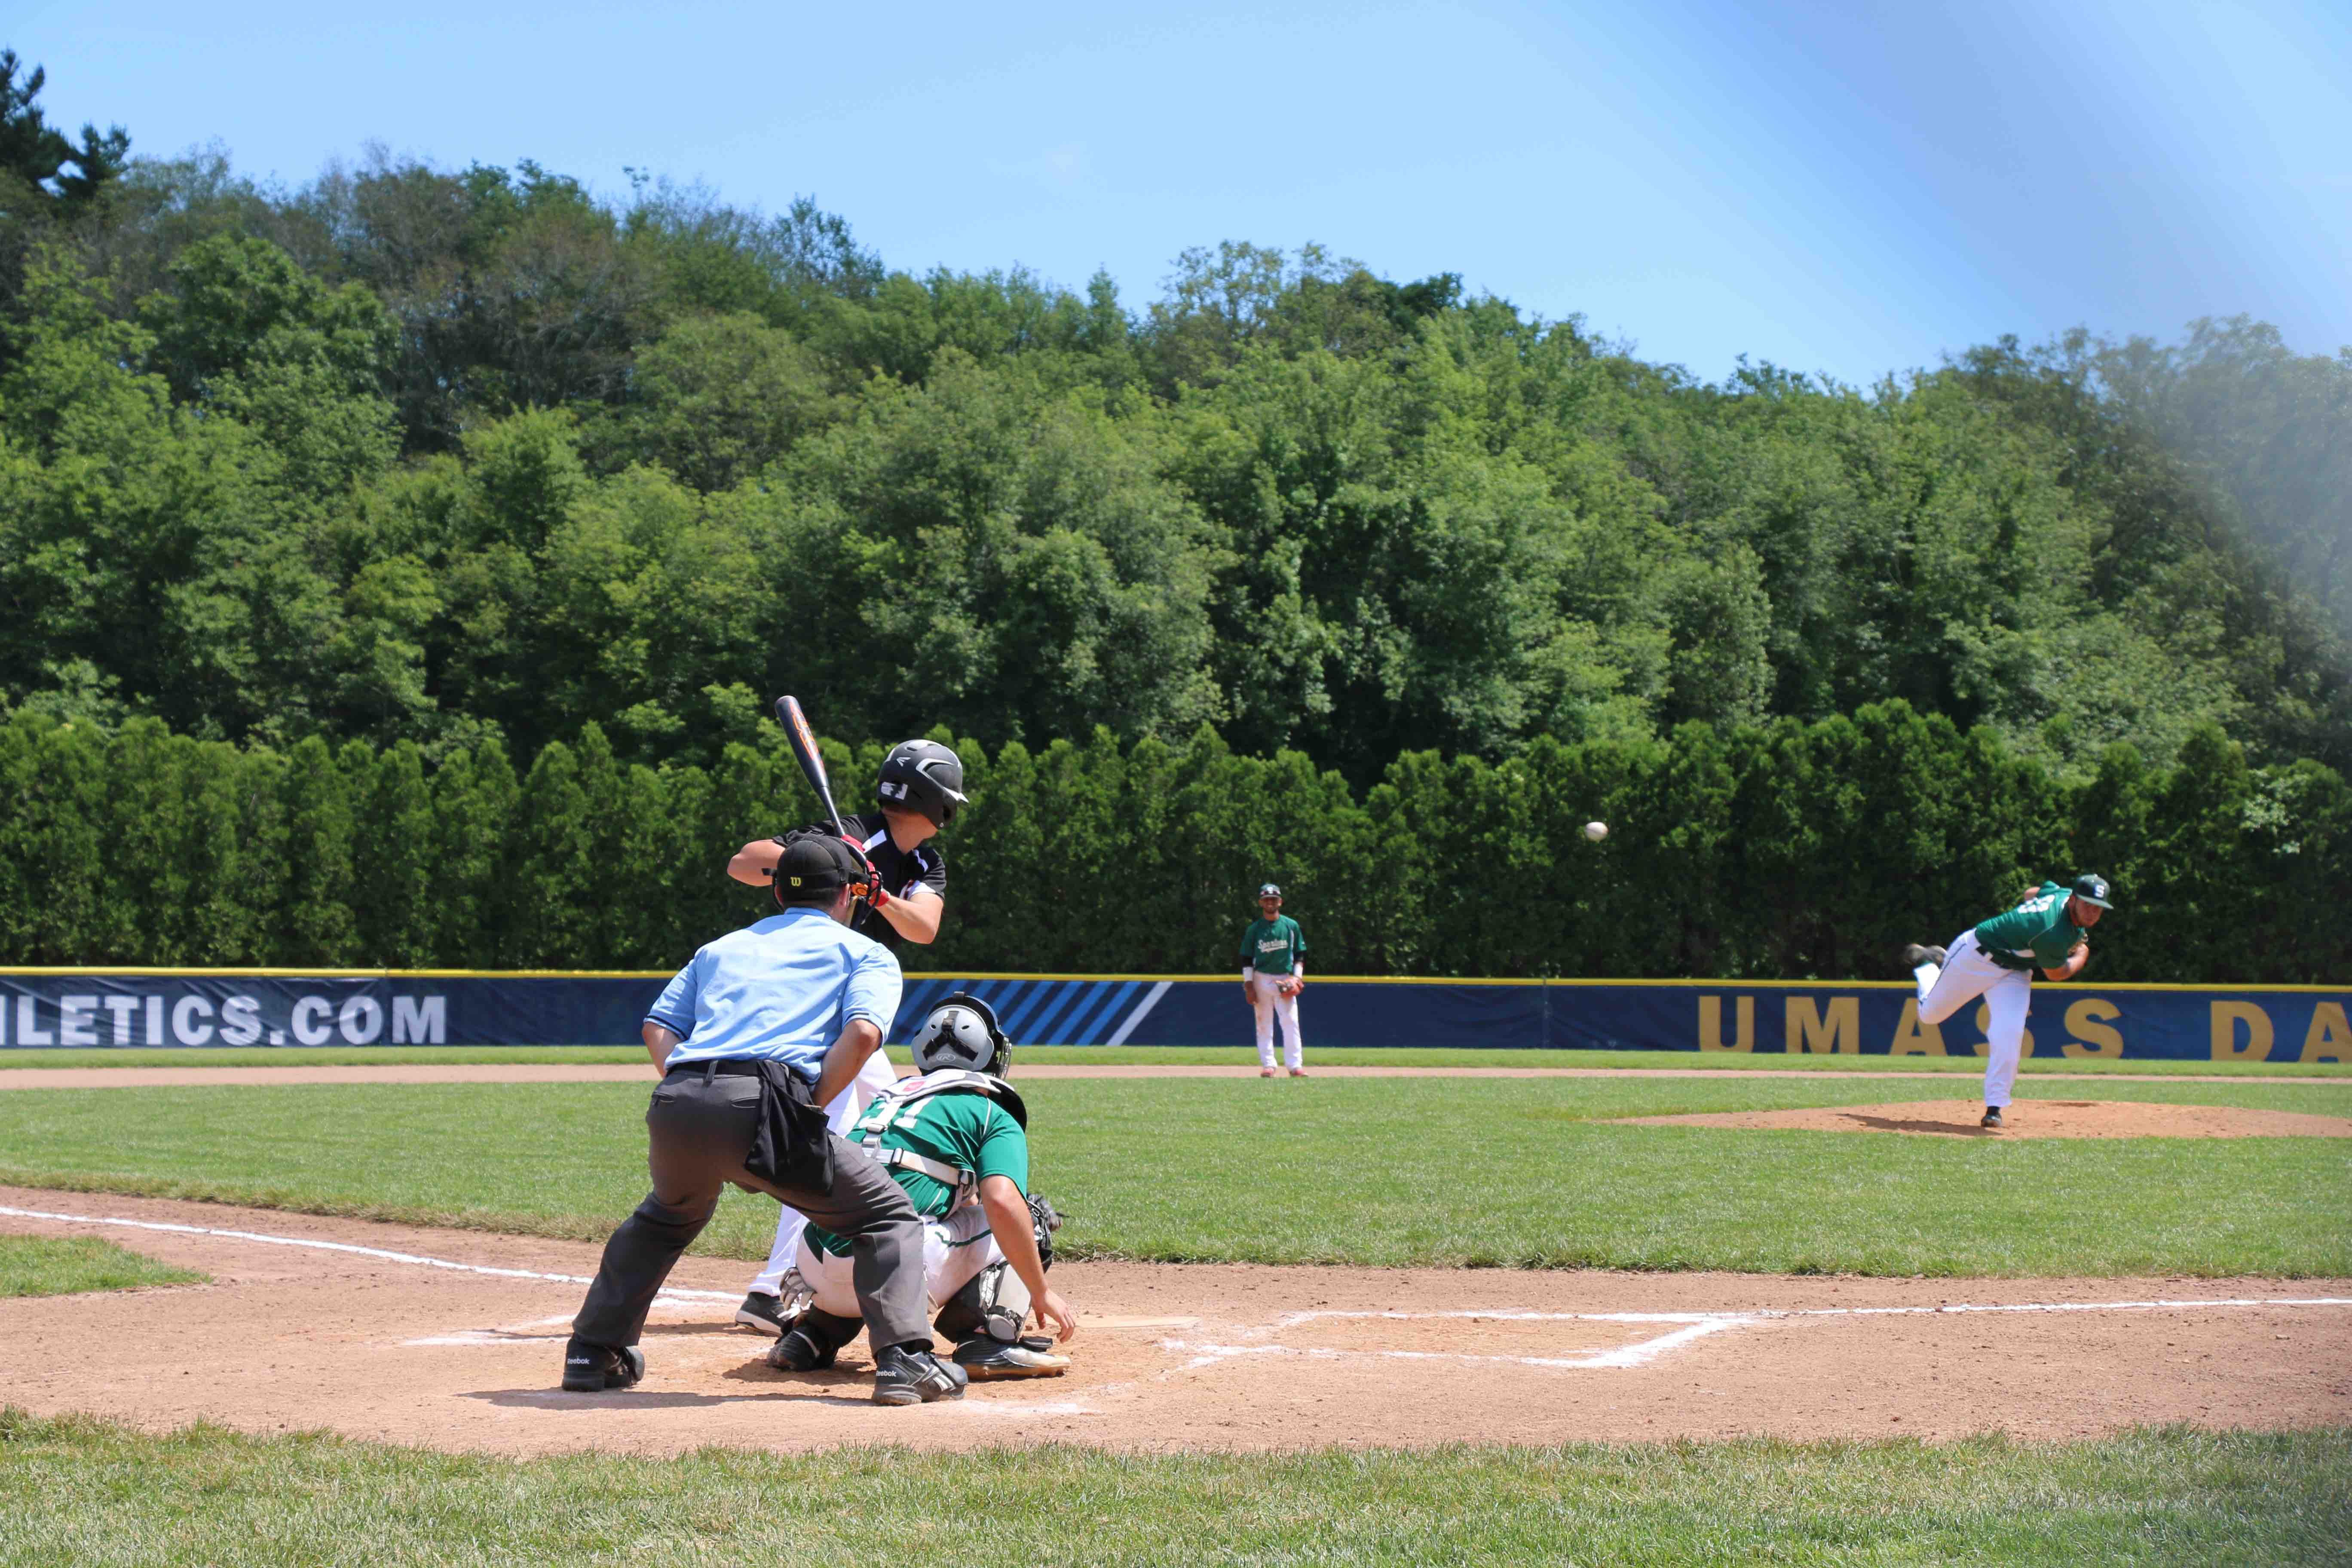 UMD Baseball-SQ